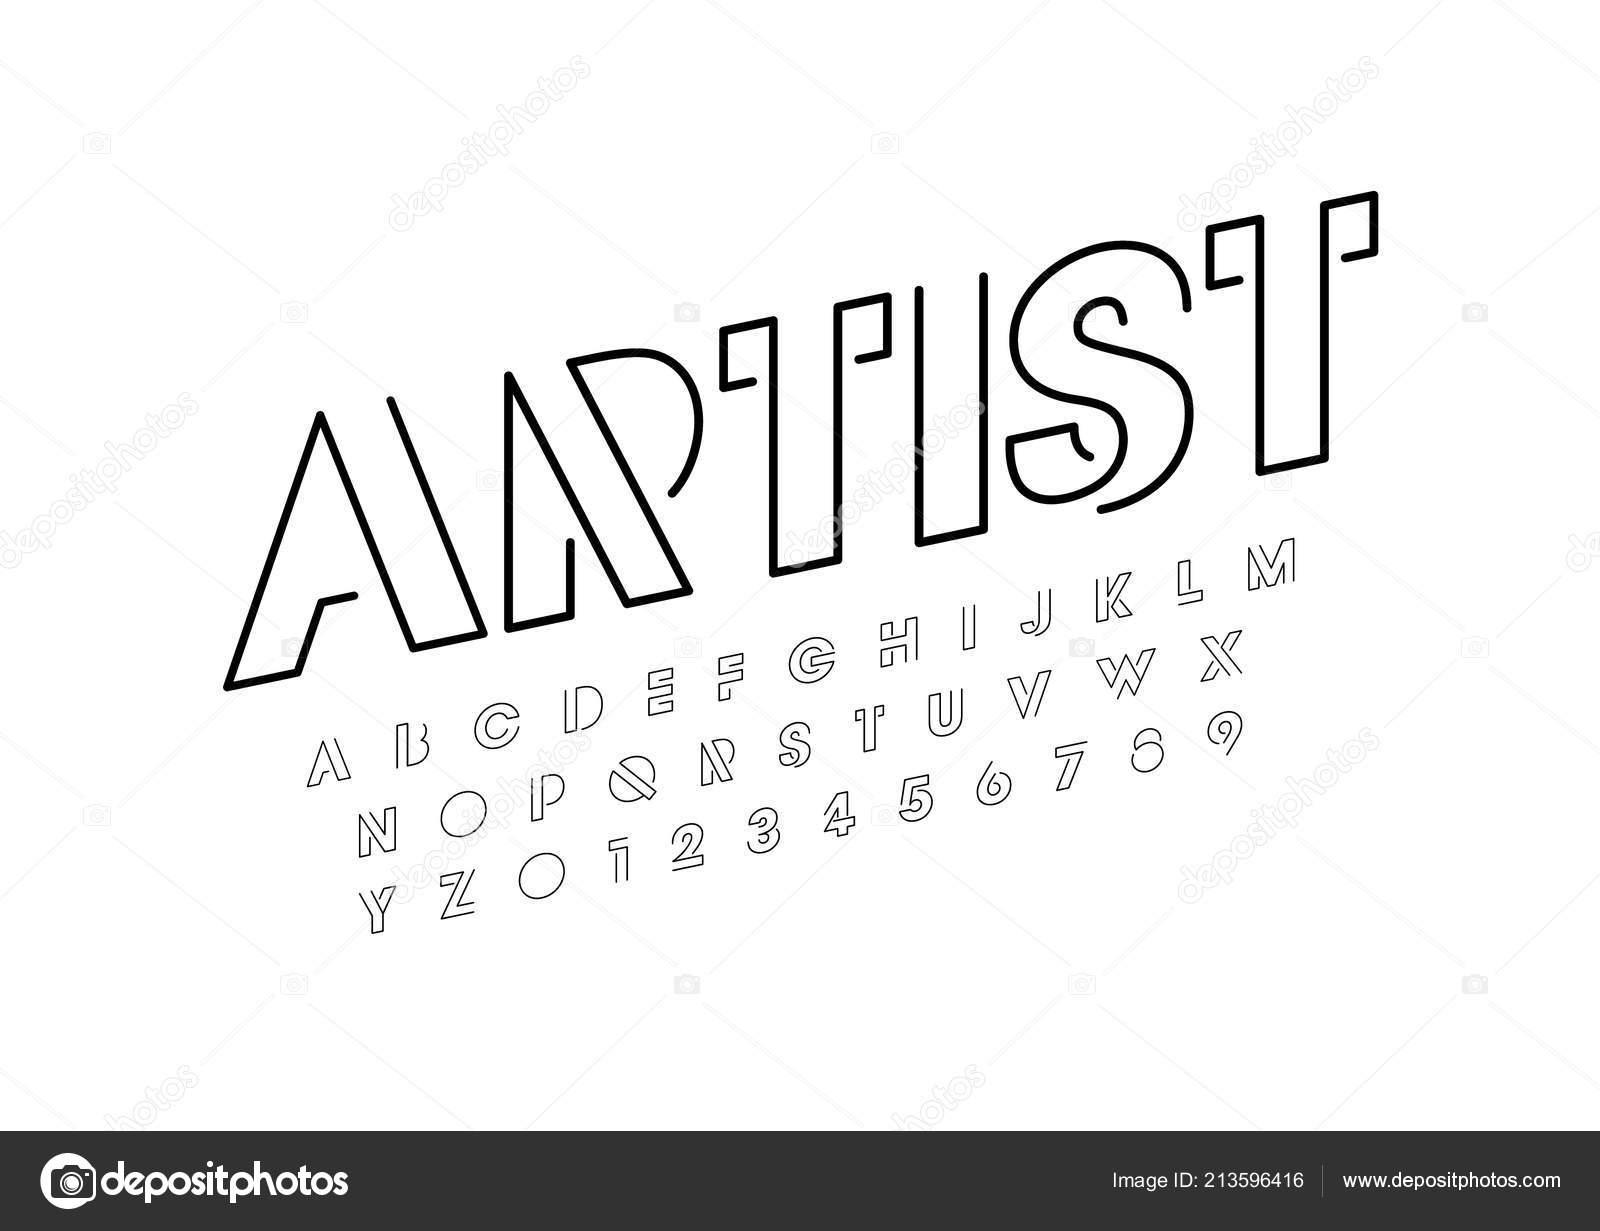 Artist Design Font Alphabet Template Colorful Vector Illustration Stylized Modern Stock Vector C Passionartist 213596416